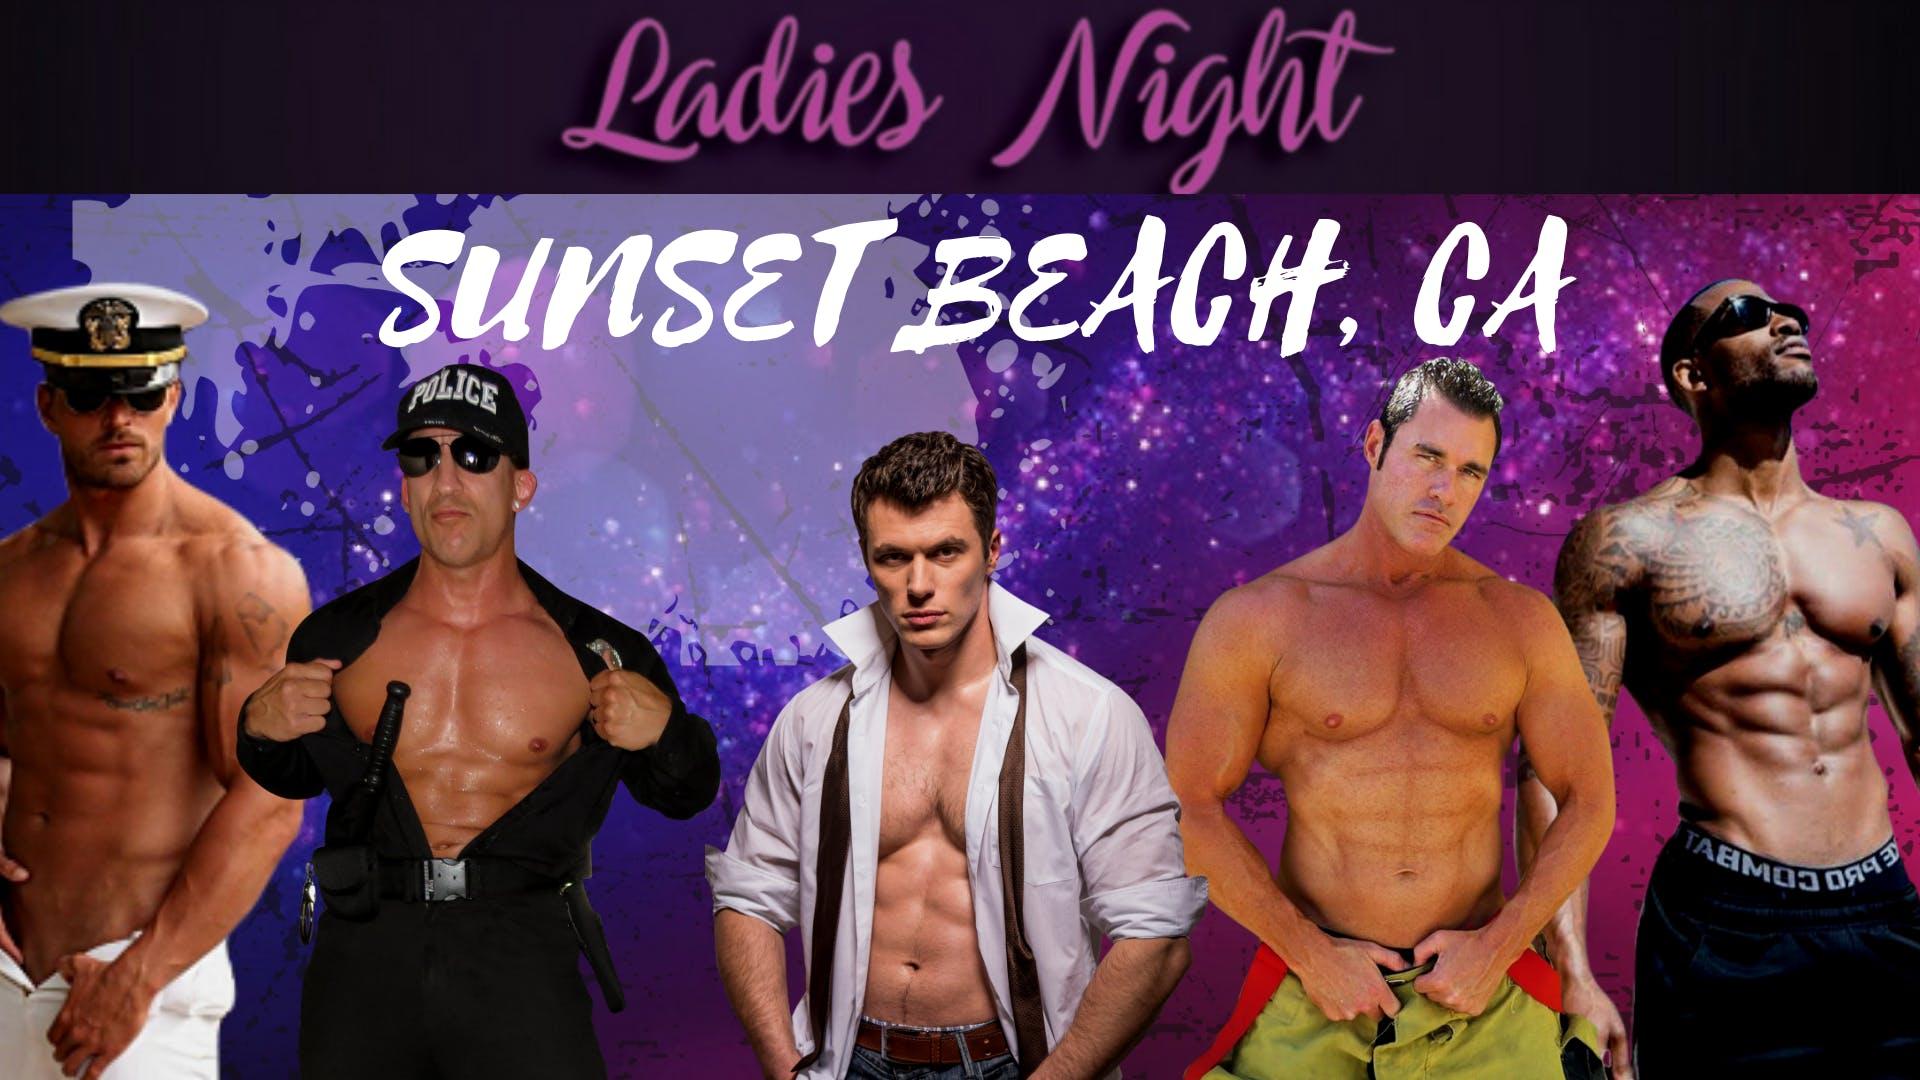 Sunset Beach, CA. 2nd Show. Magic Mike Show L